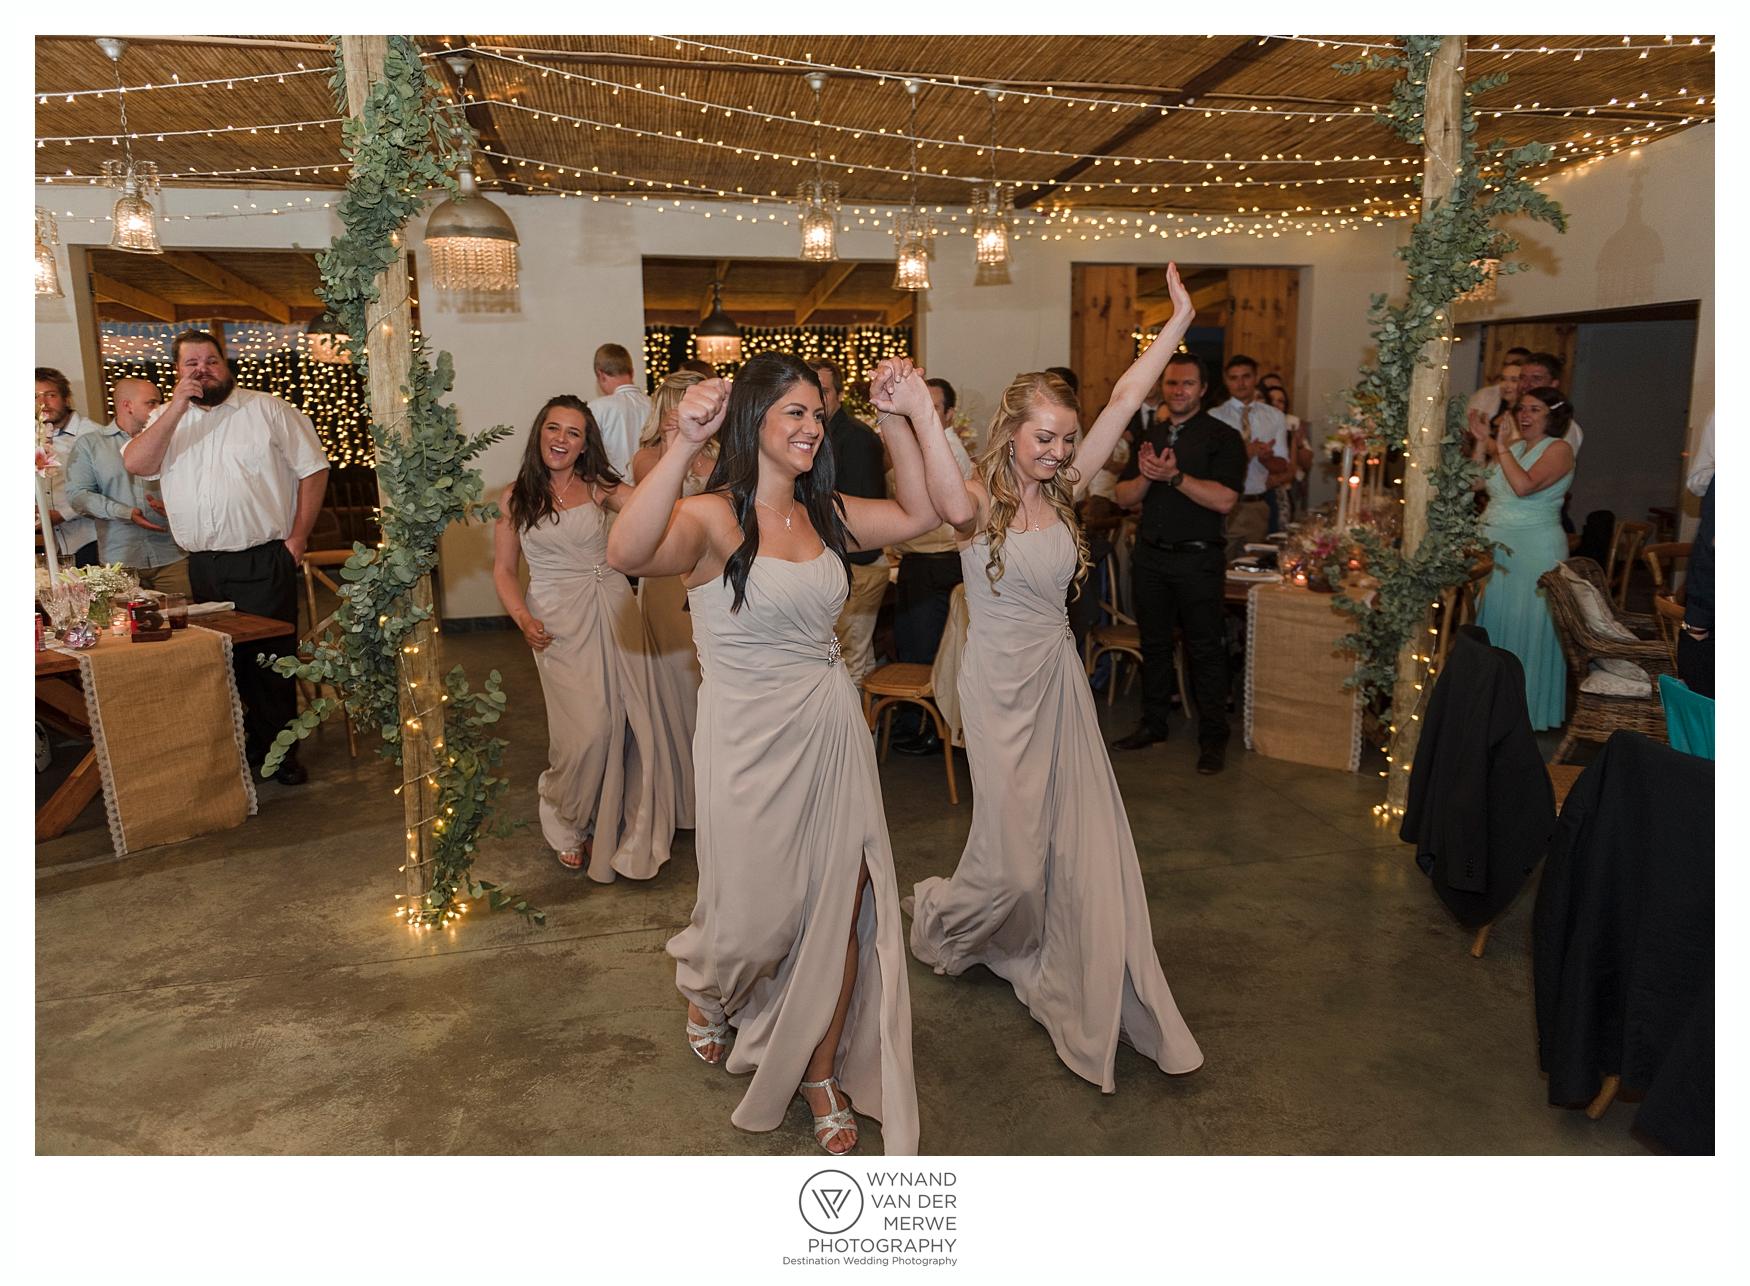 Wynandvandermerwe ryan natalia wedding photography cradle valley guesthouse gauteng-539.jpg